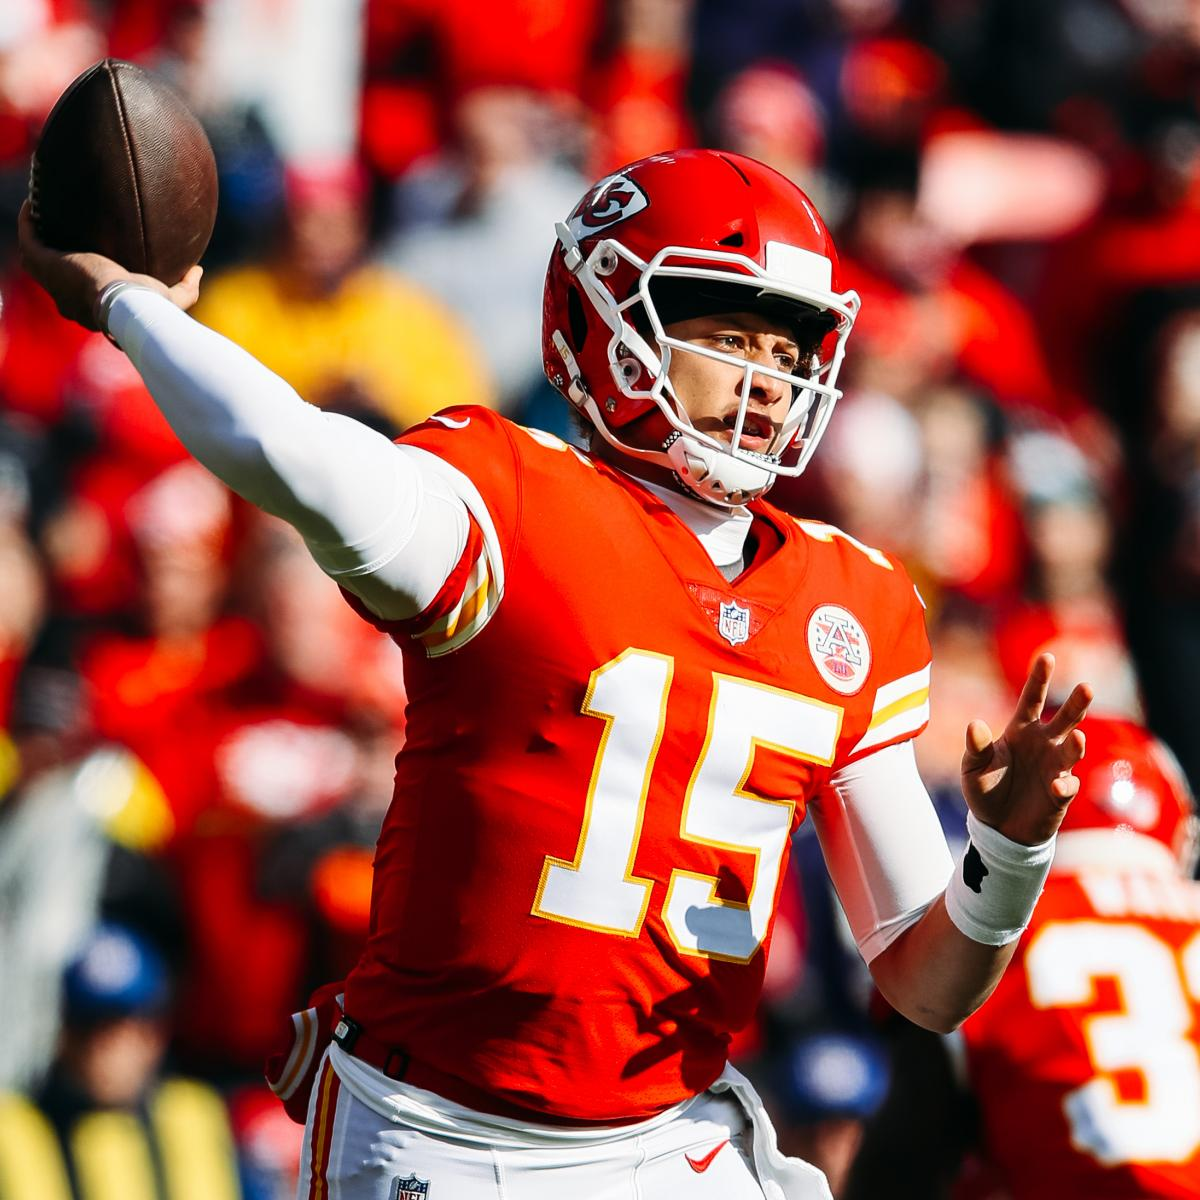 NFL Week 15 Football Betting Odds